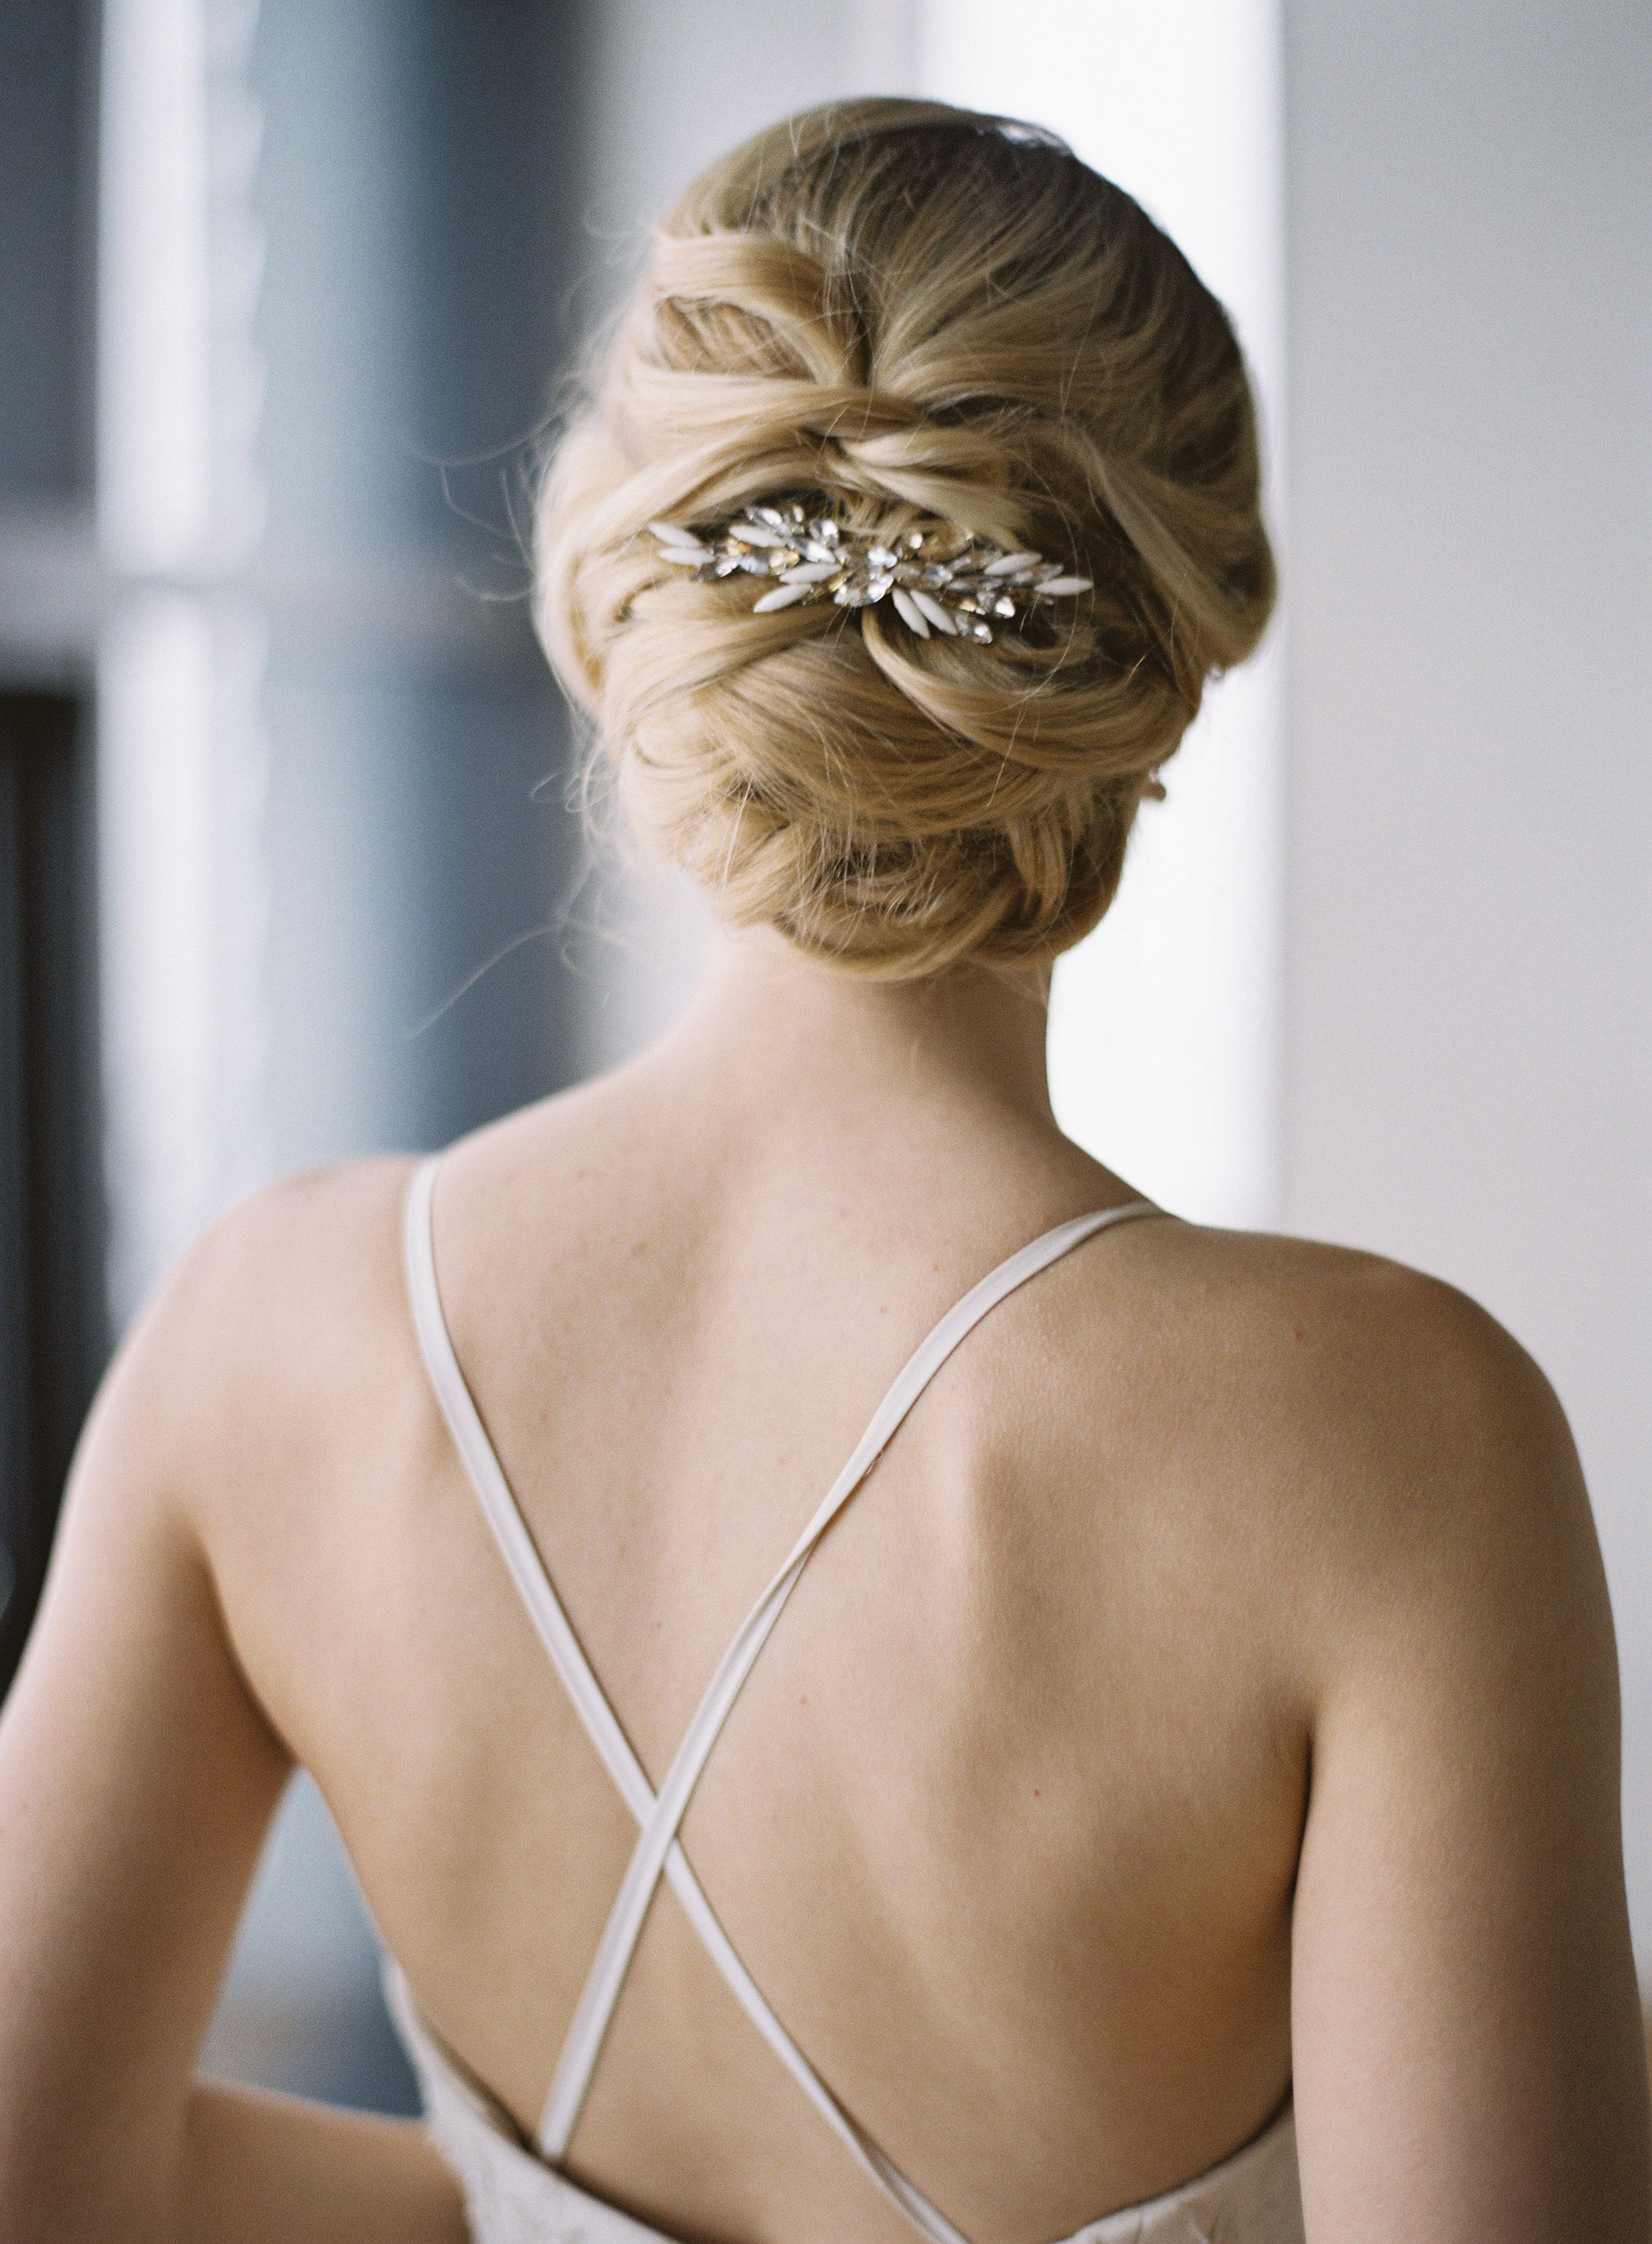 industrial romantic nyc wedding inspiration shoot at boro